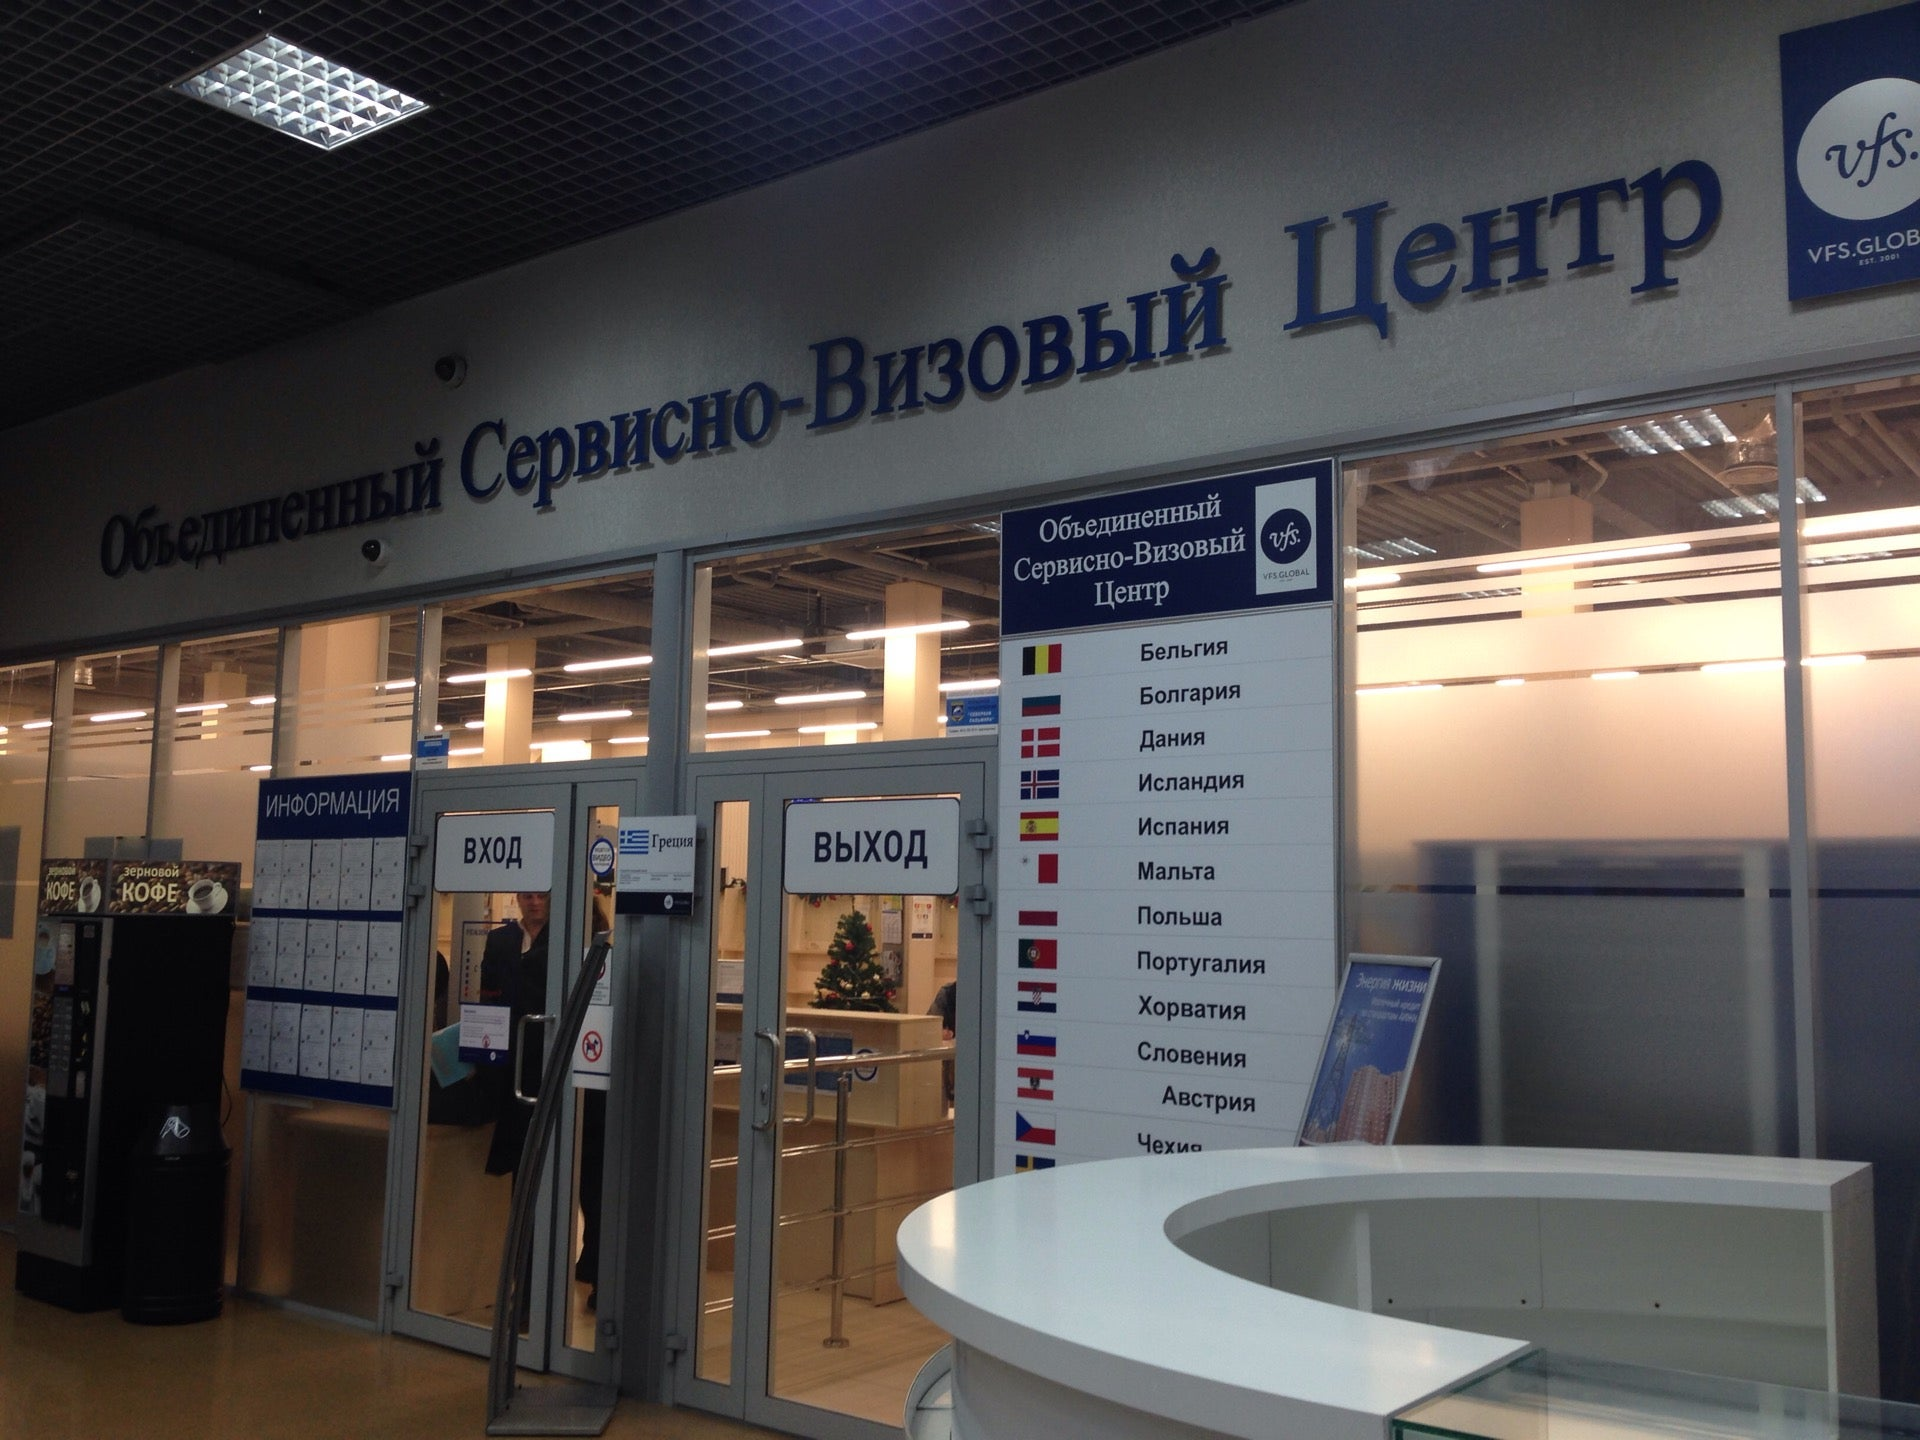 Сервисно-визовый центр